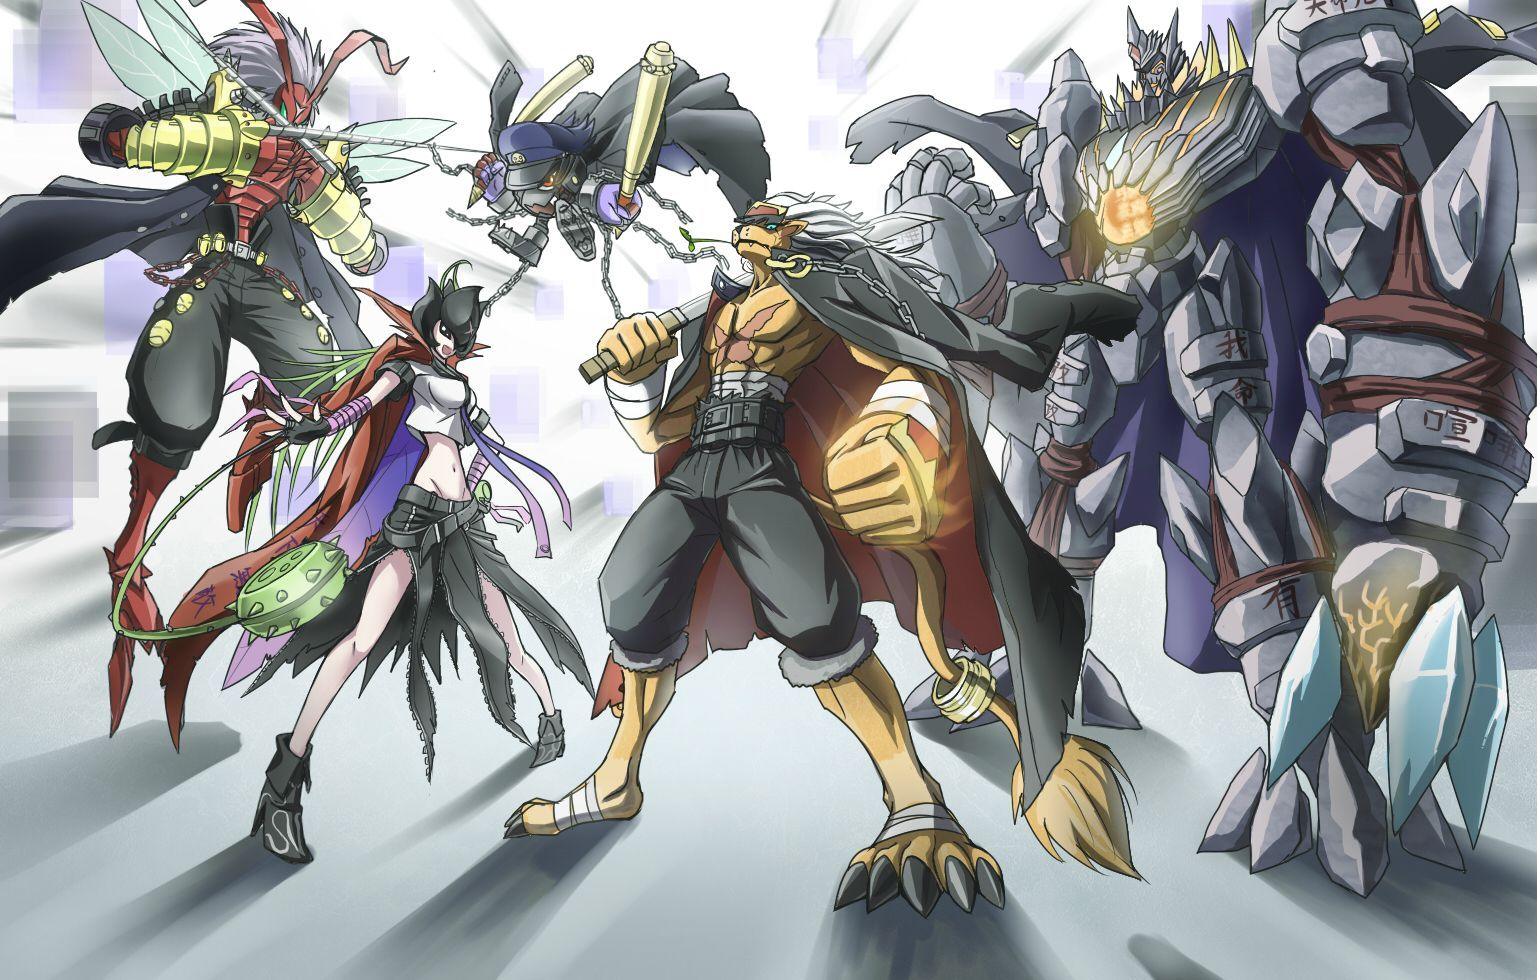 Digimon, Banchoteam, BanchoStingmon, BanchoLilymon, BanchoMamemon, BanchoLeomon, BanchoGolemon